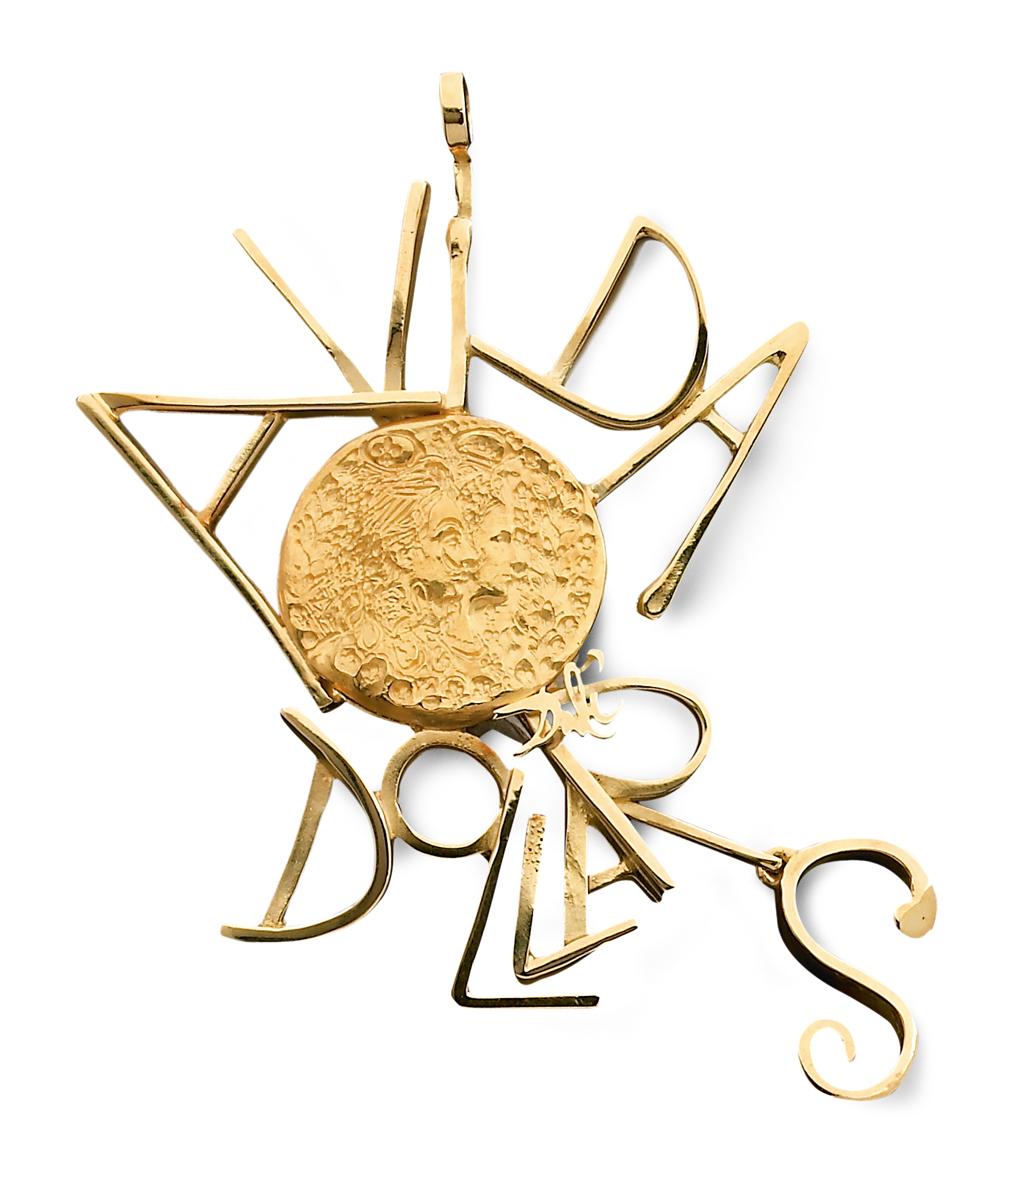 Salvador Dalí, Avida Dollars, hanger, 1966-1967. Particuliere collectie, Parijs, goud